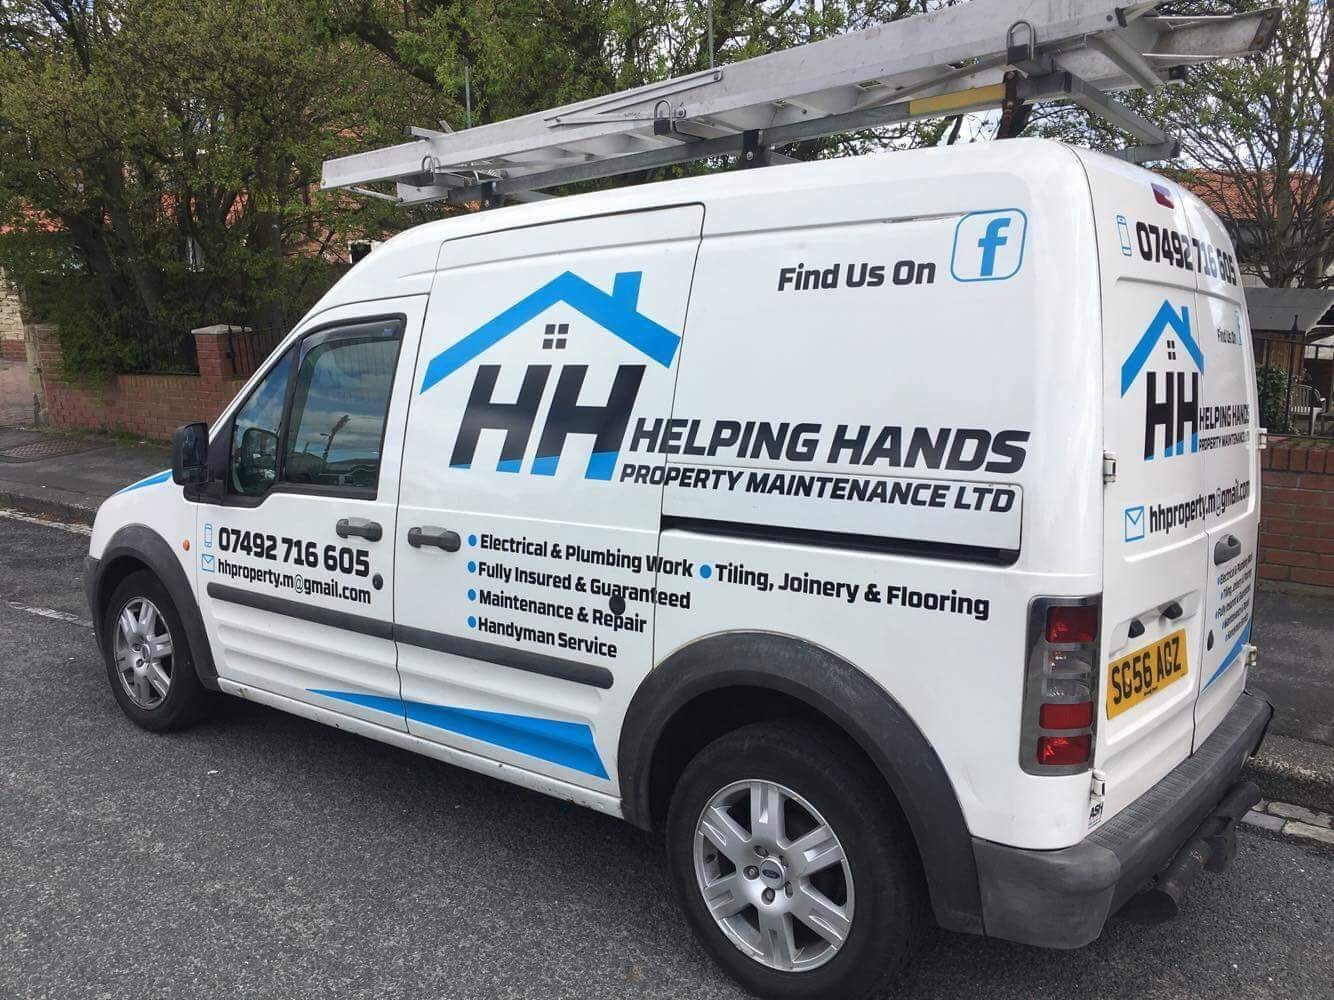 Helping hands property maintenance ltd